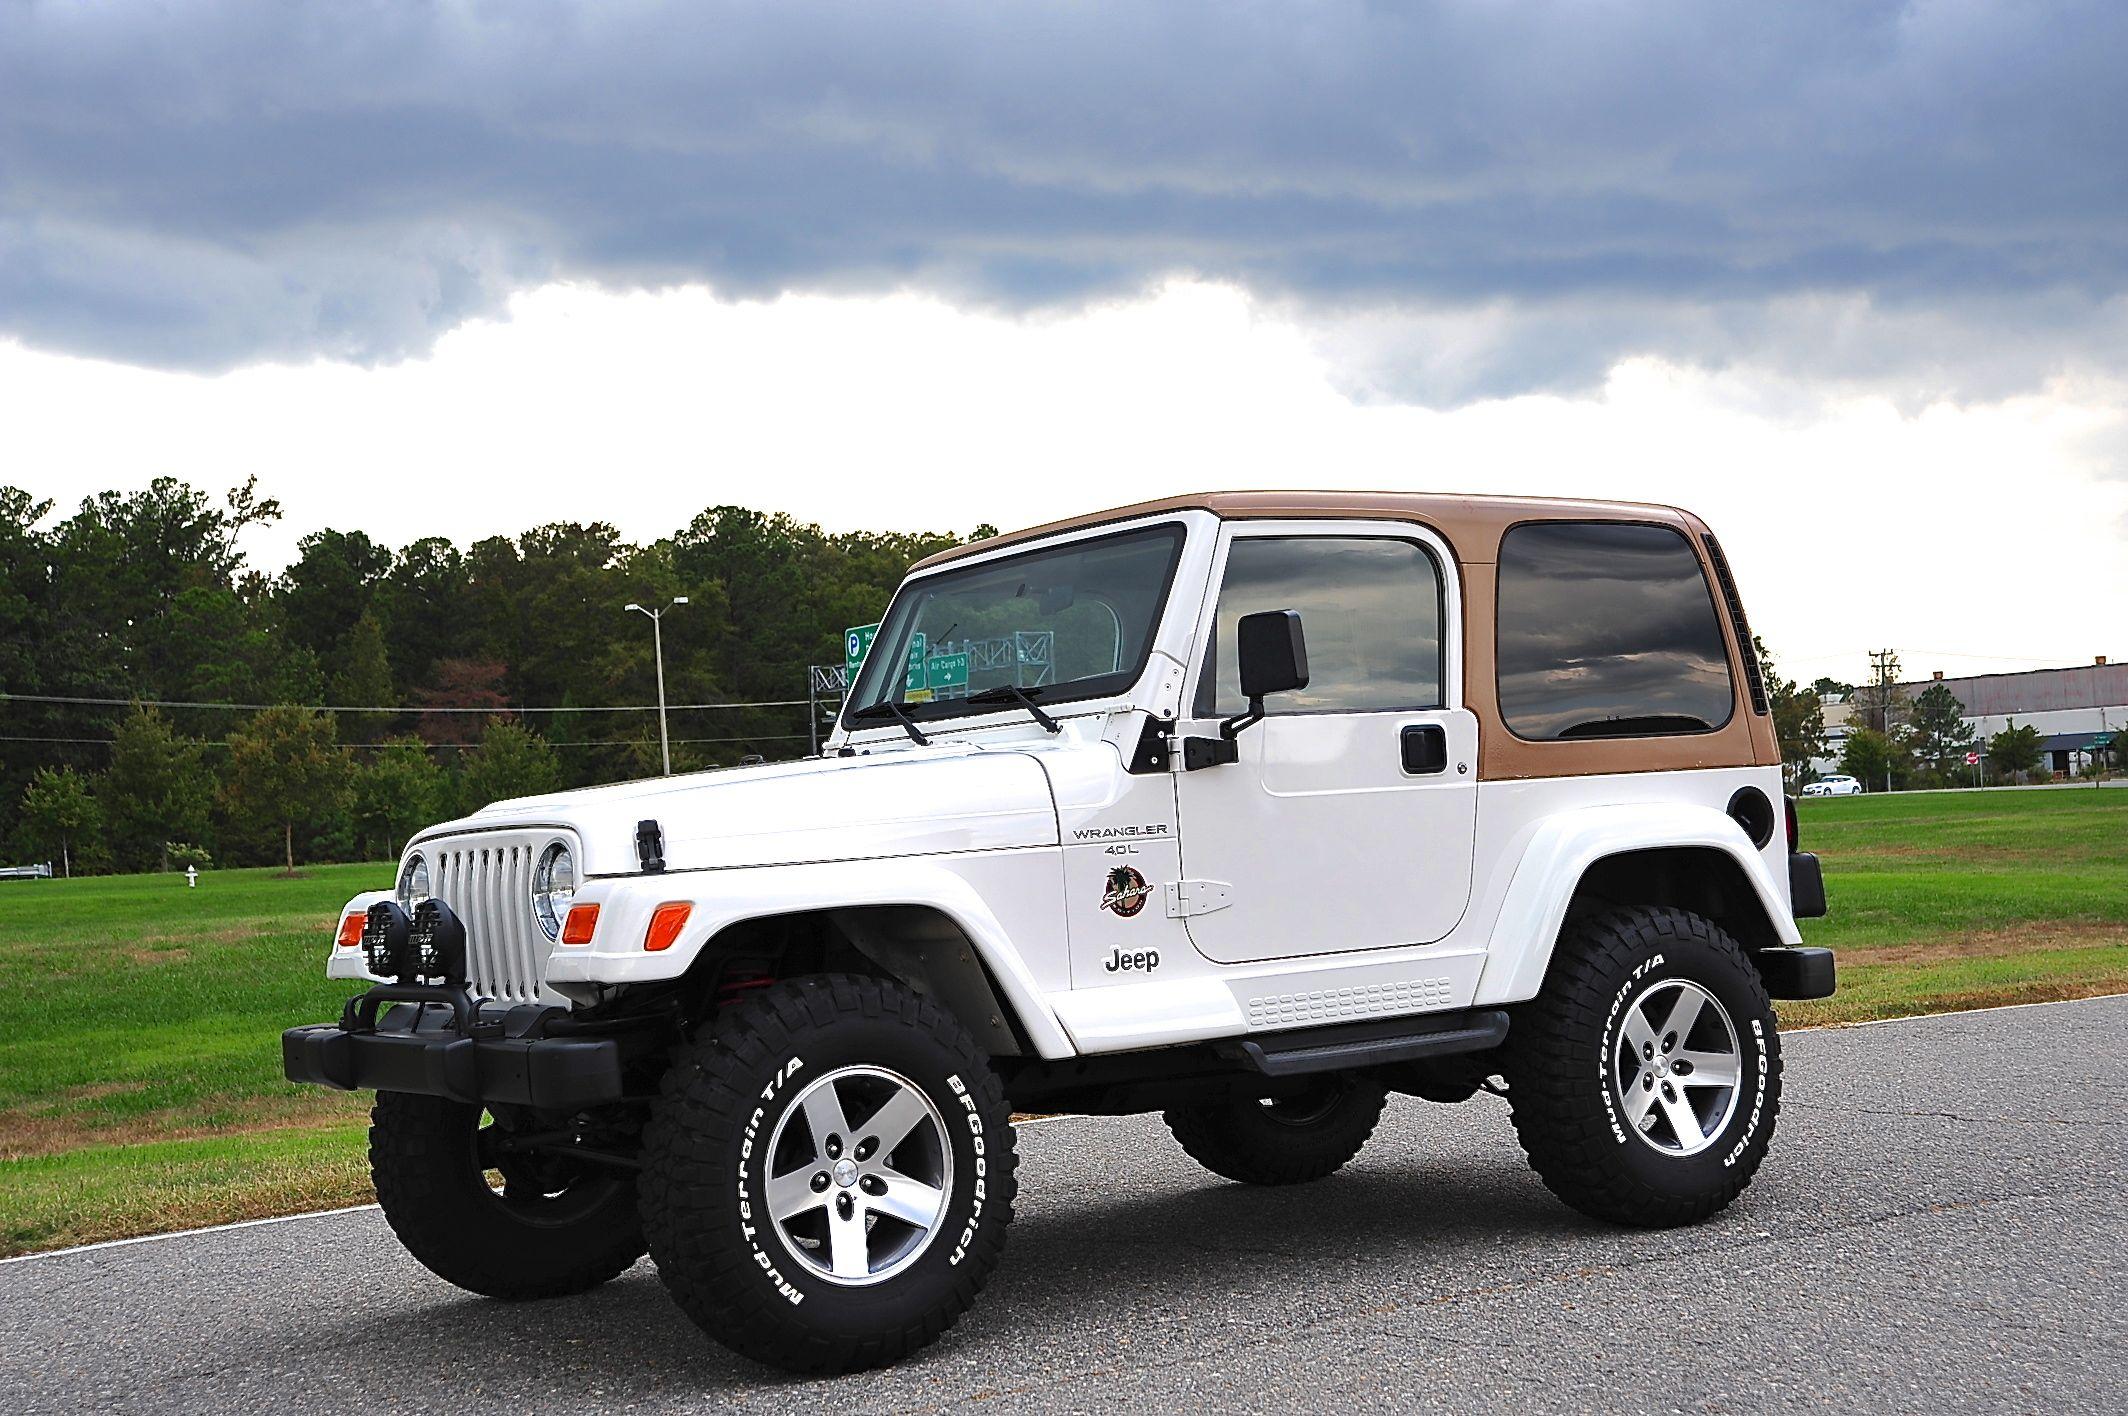 2000 Jeep Wrangler Sahara w/5spd Sweet color combo. 2000